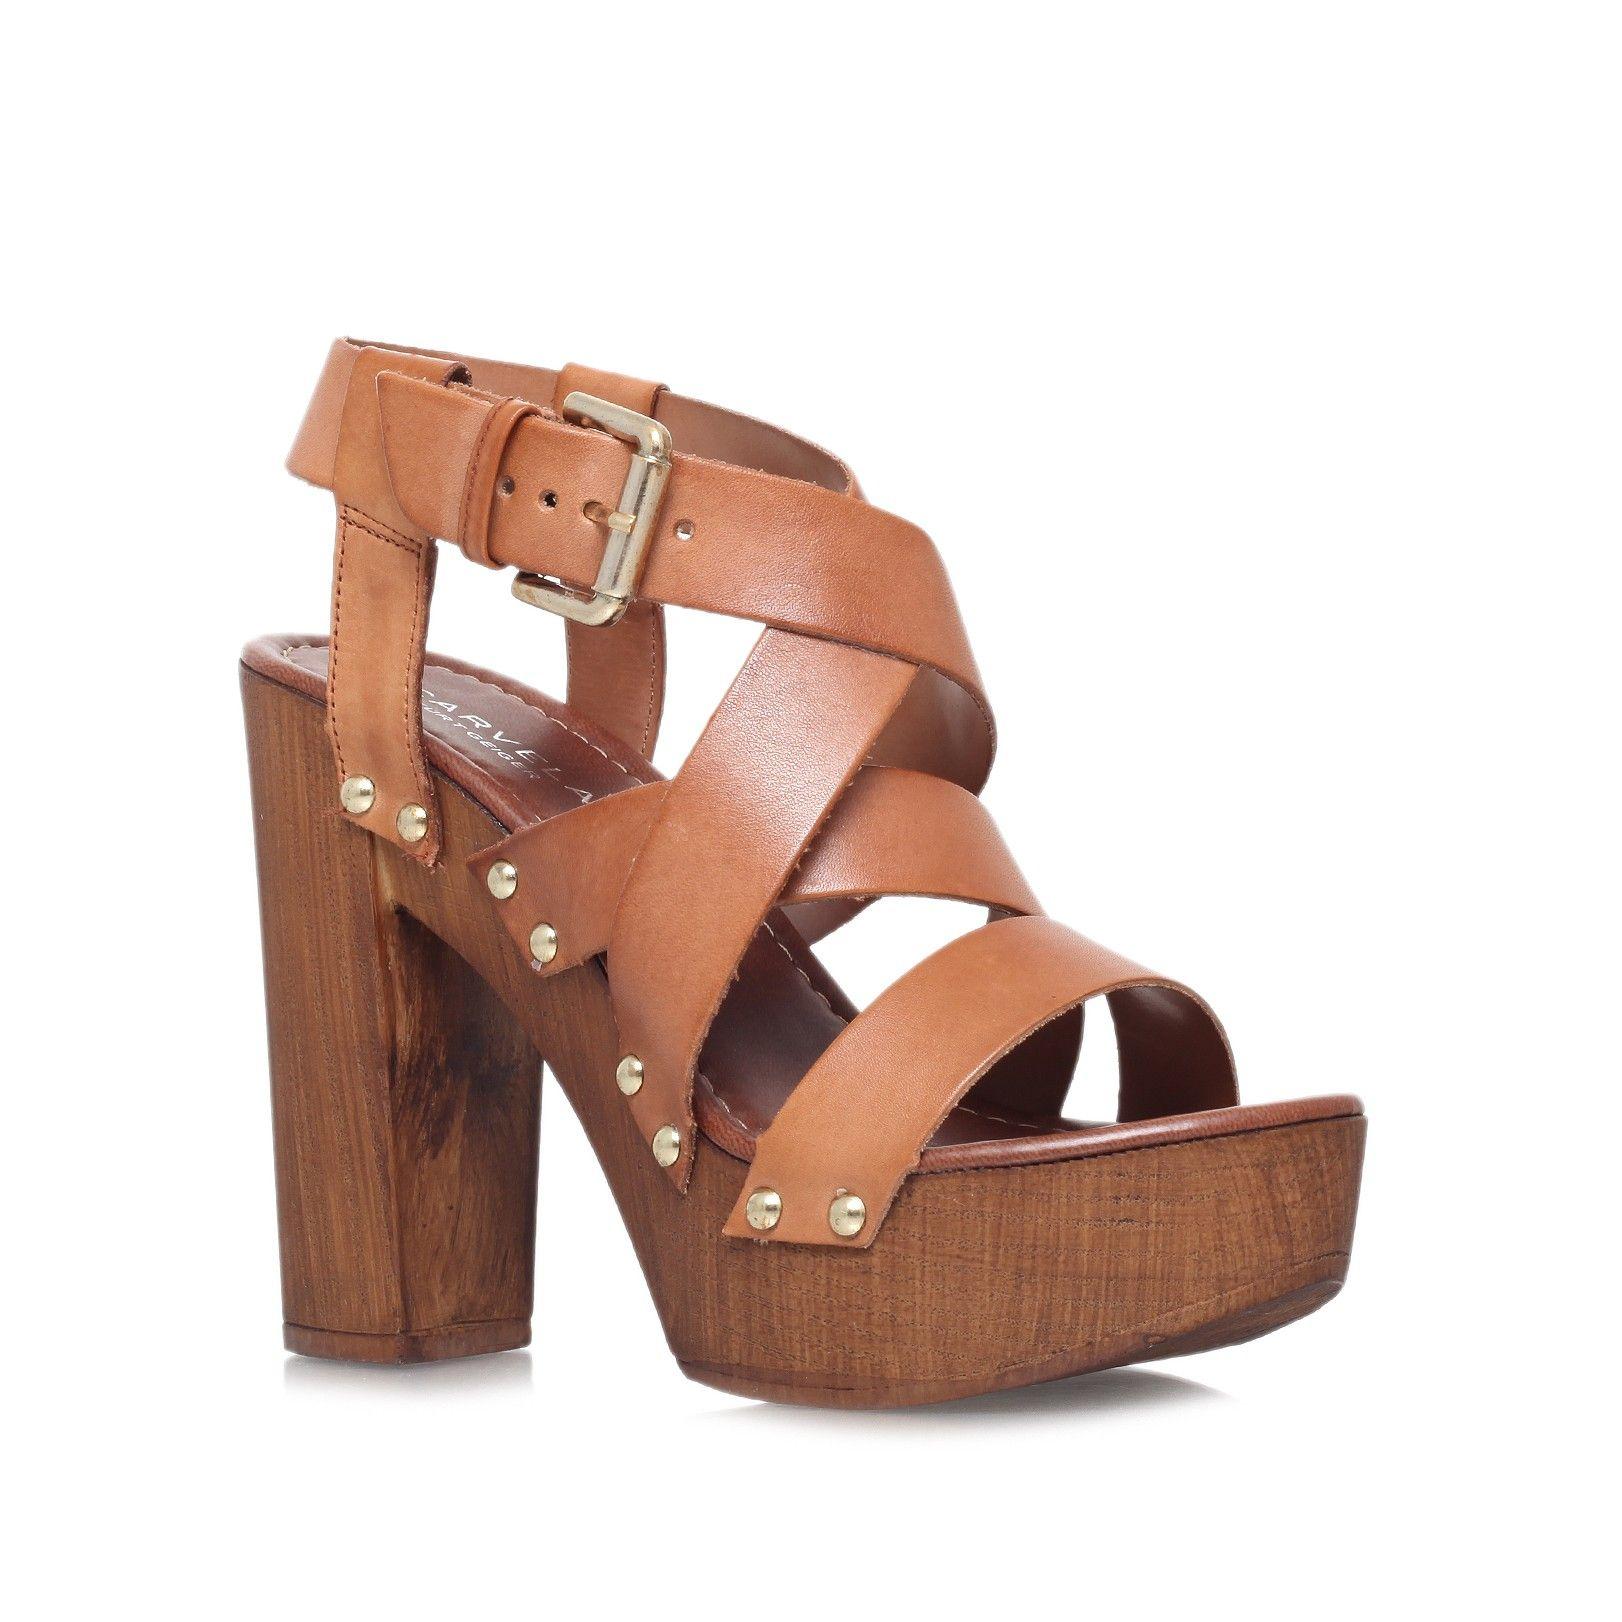 kookie tan high heel sandals from Carvela Kurt Geiger